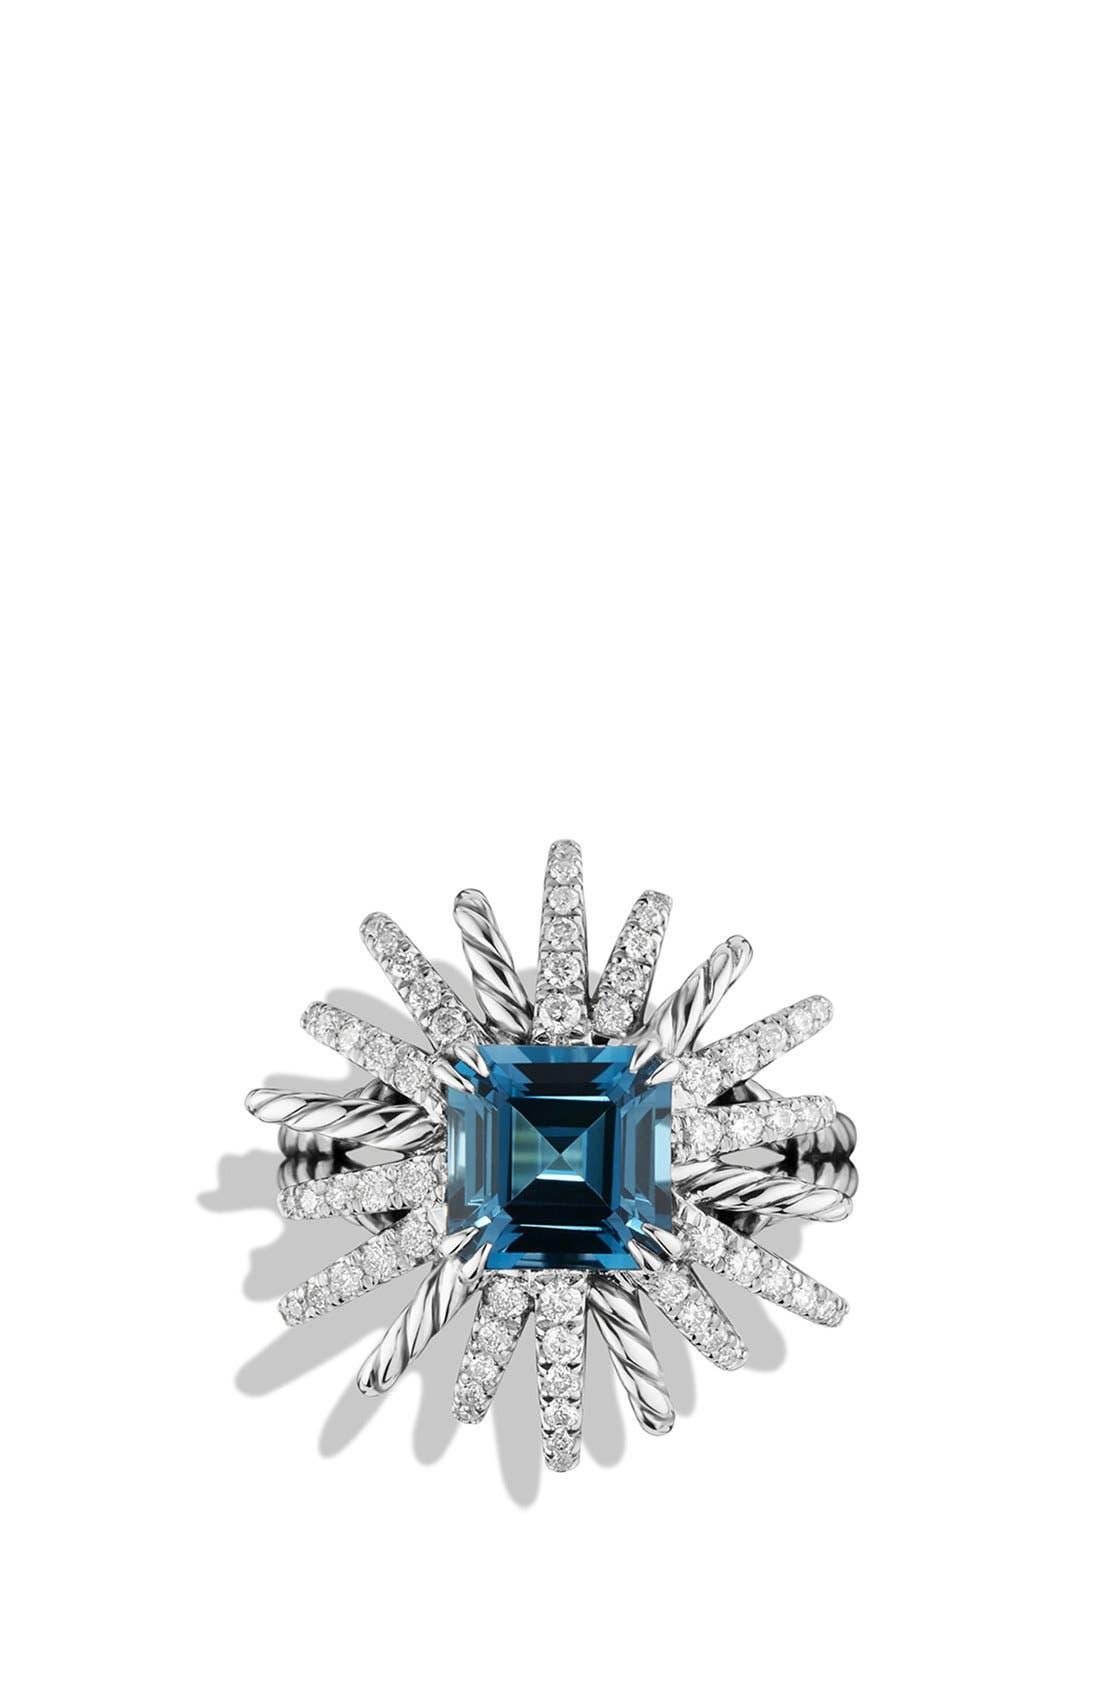 DAVID YURMAN,                             'Starburst' Ring with Diamonds in Silver,                             Alternate thumbnail 3, color,                             402